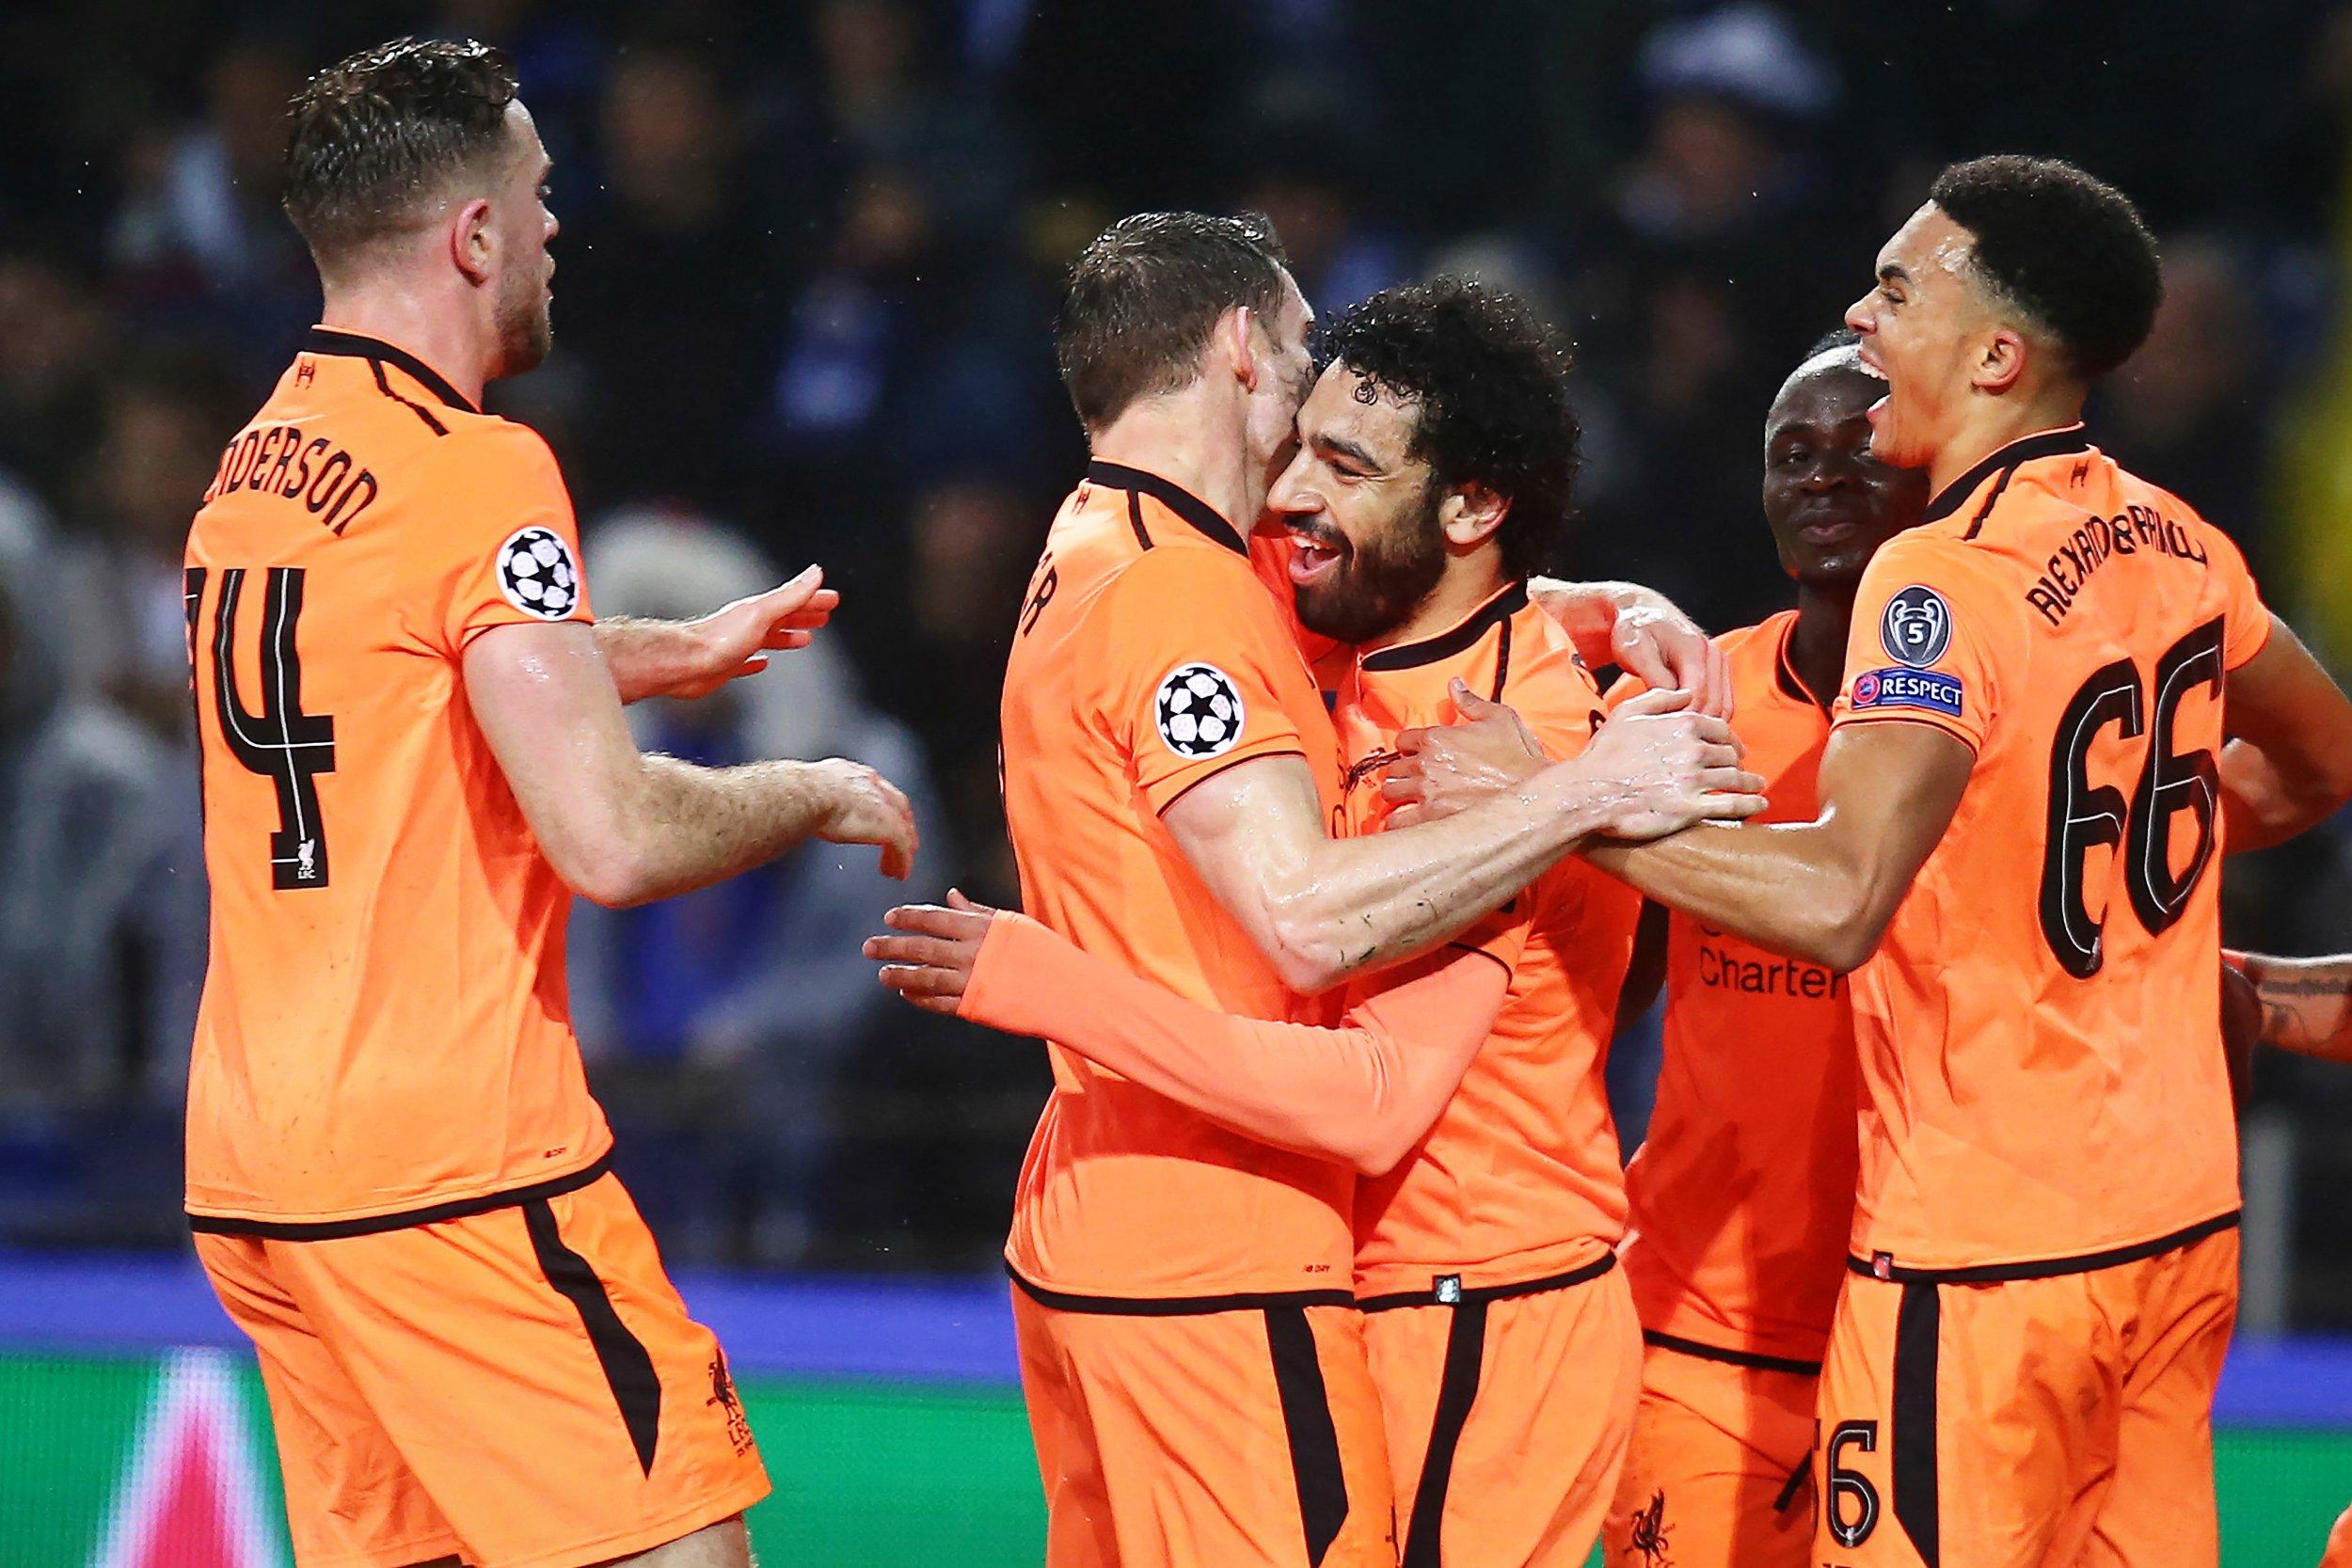 Liverpool vs Porto TV channel, live stream, kick-off time, date, odds and team news